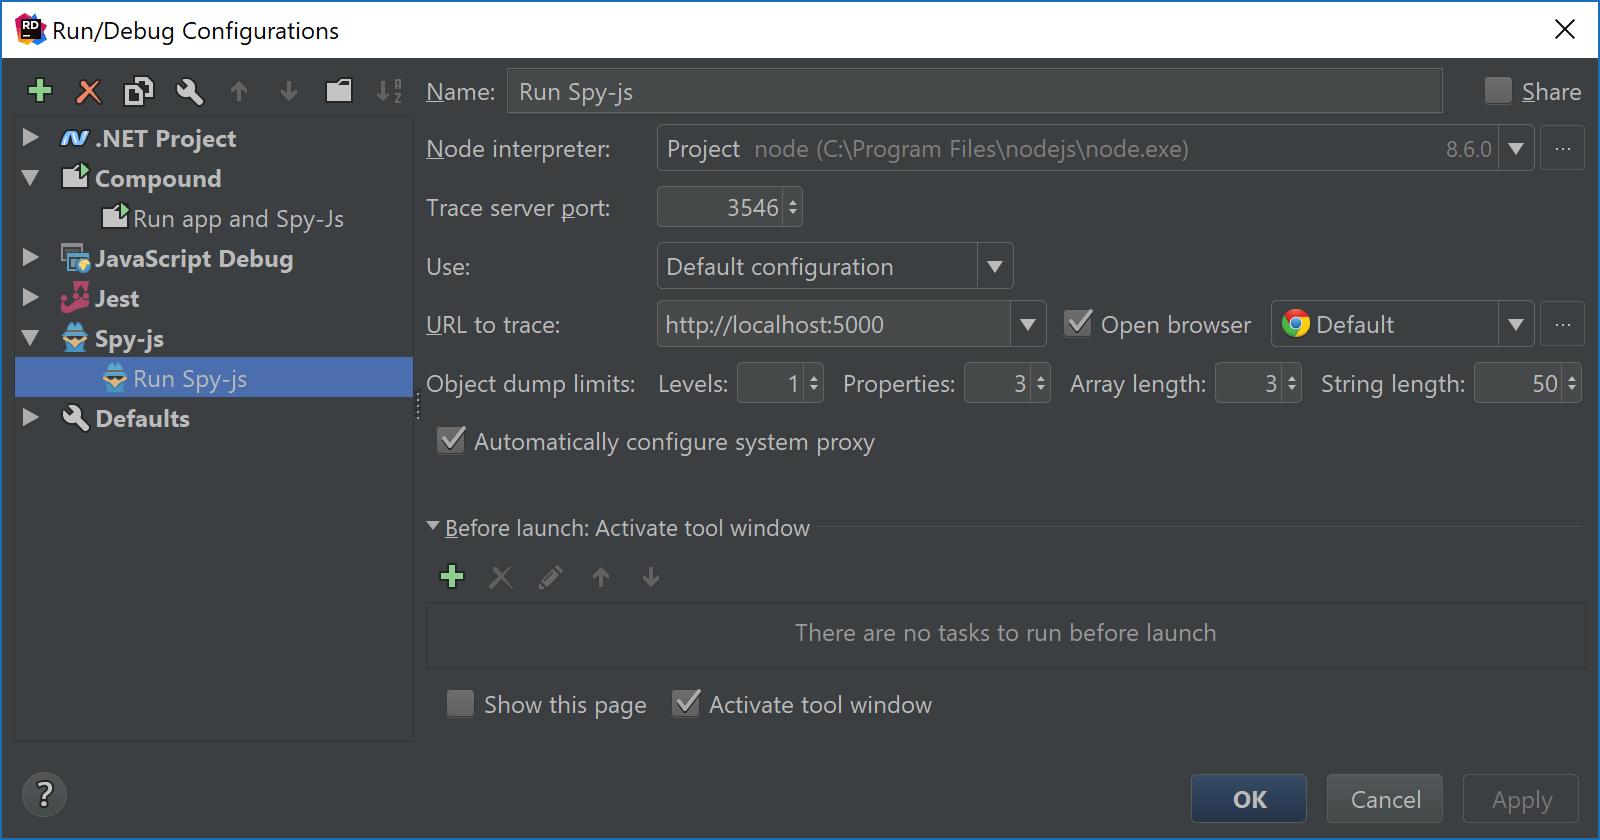 Spy-js Run/Debug configuration